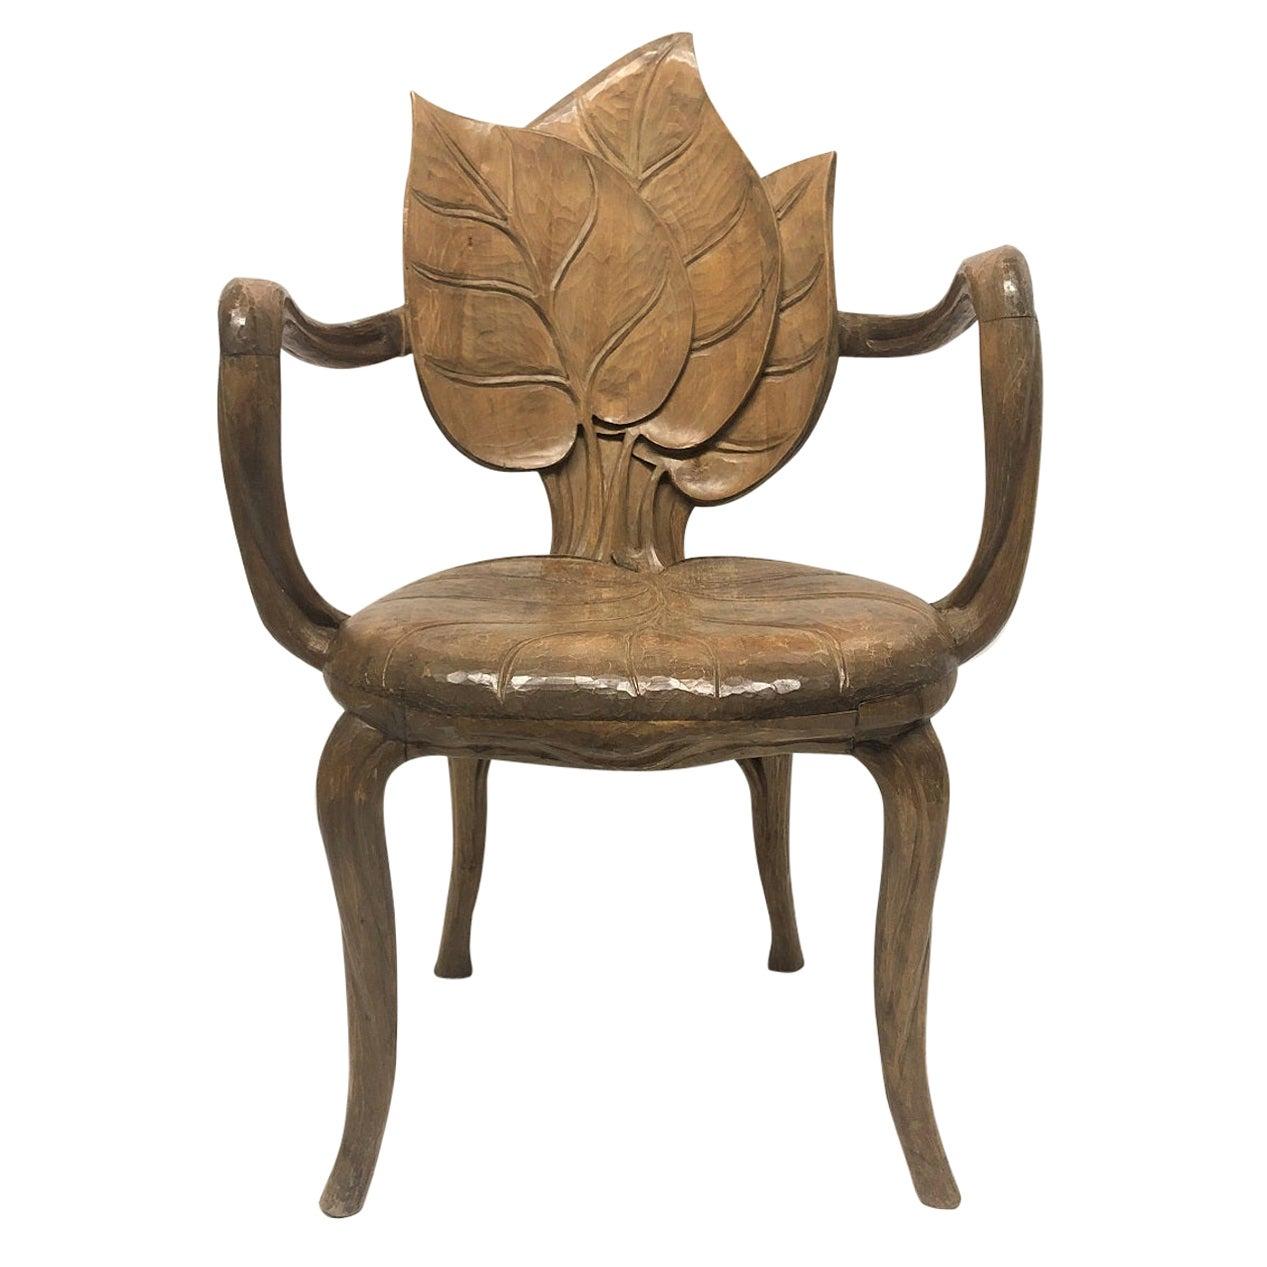 Bartolozzi & Maioli Carved Wooden Leaf Armchair